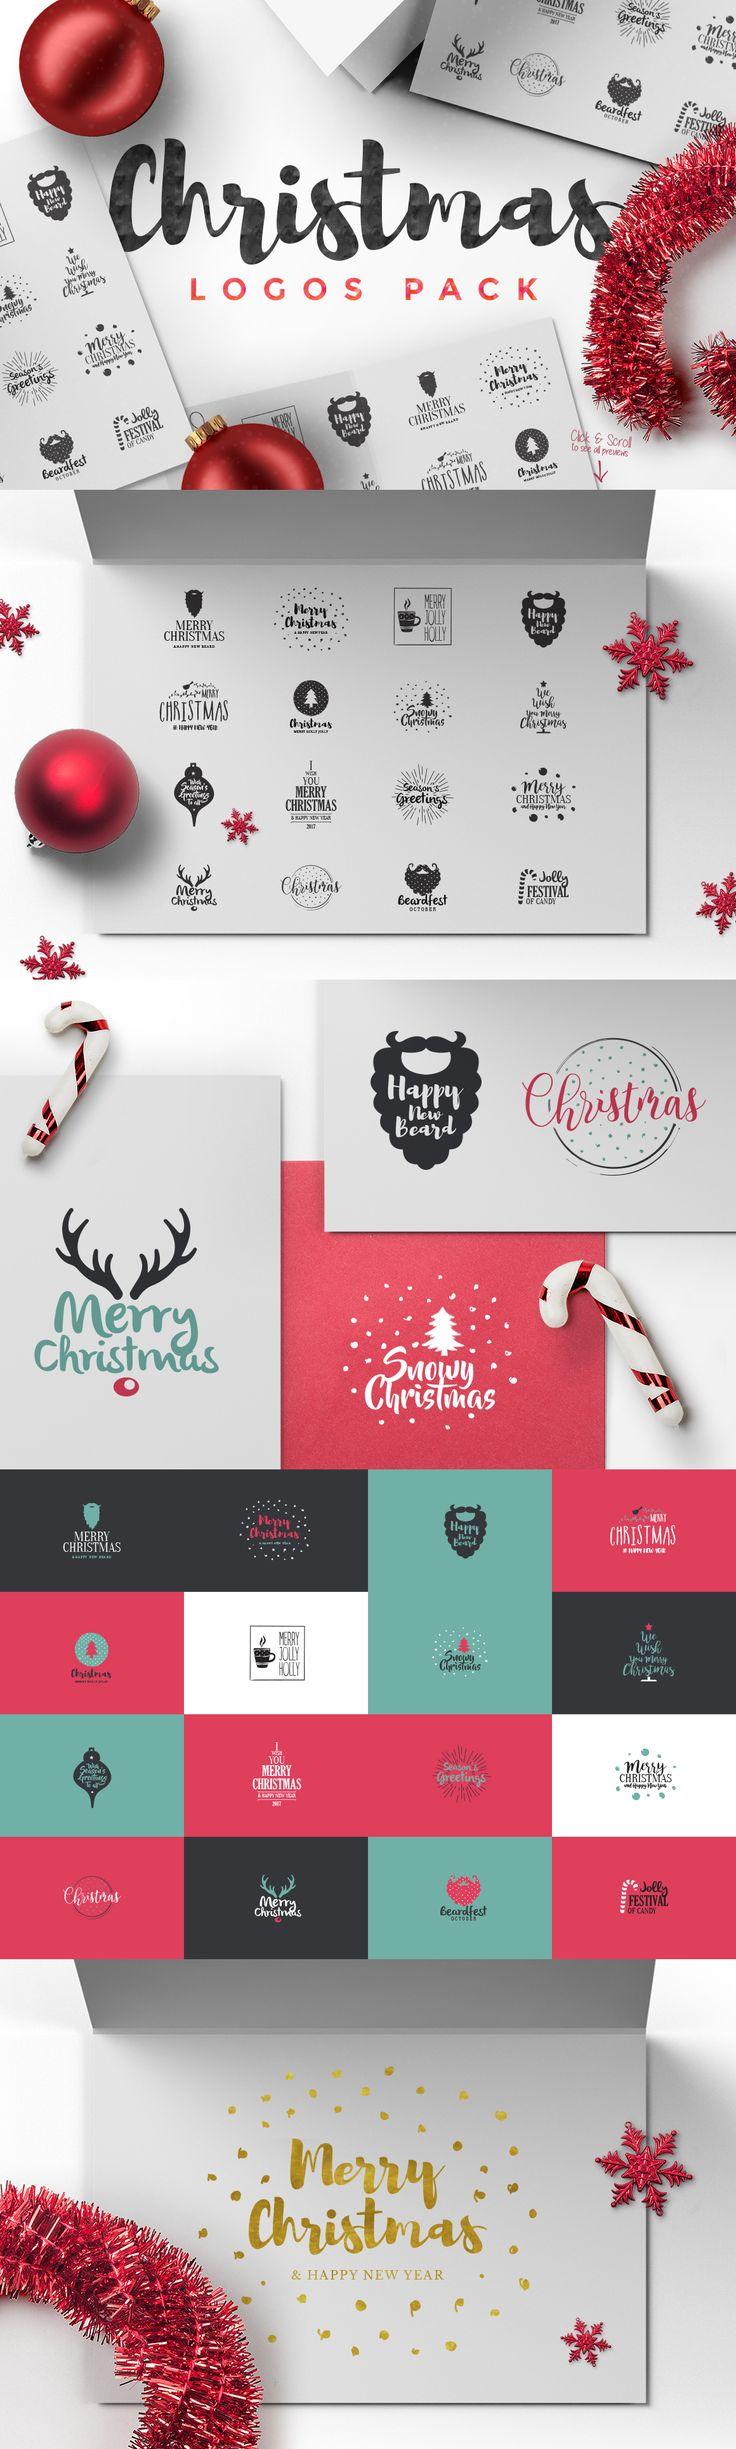 75% OFF - Christmas Megabundle by Zeppelin Graphics on @creativemarket